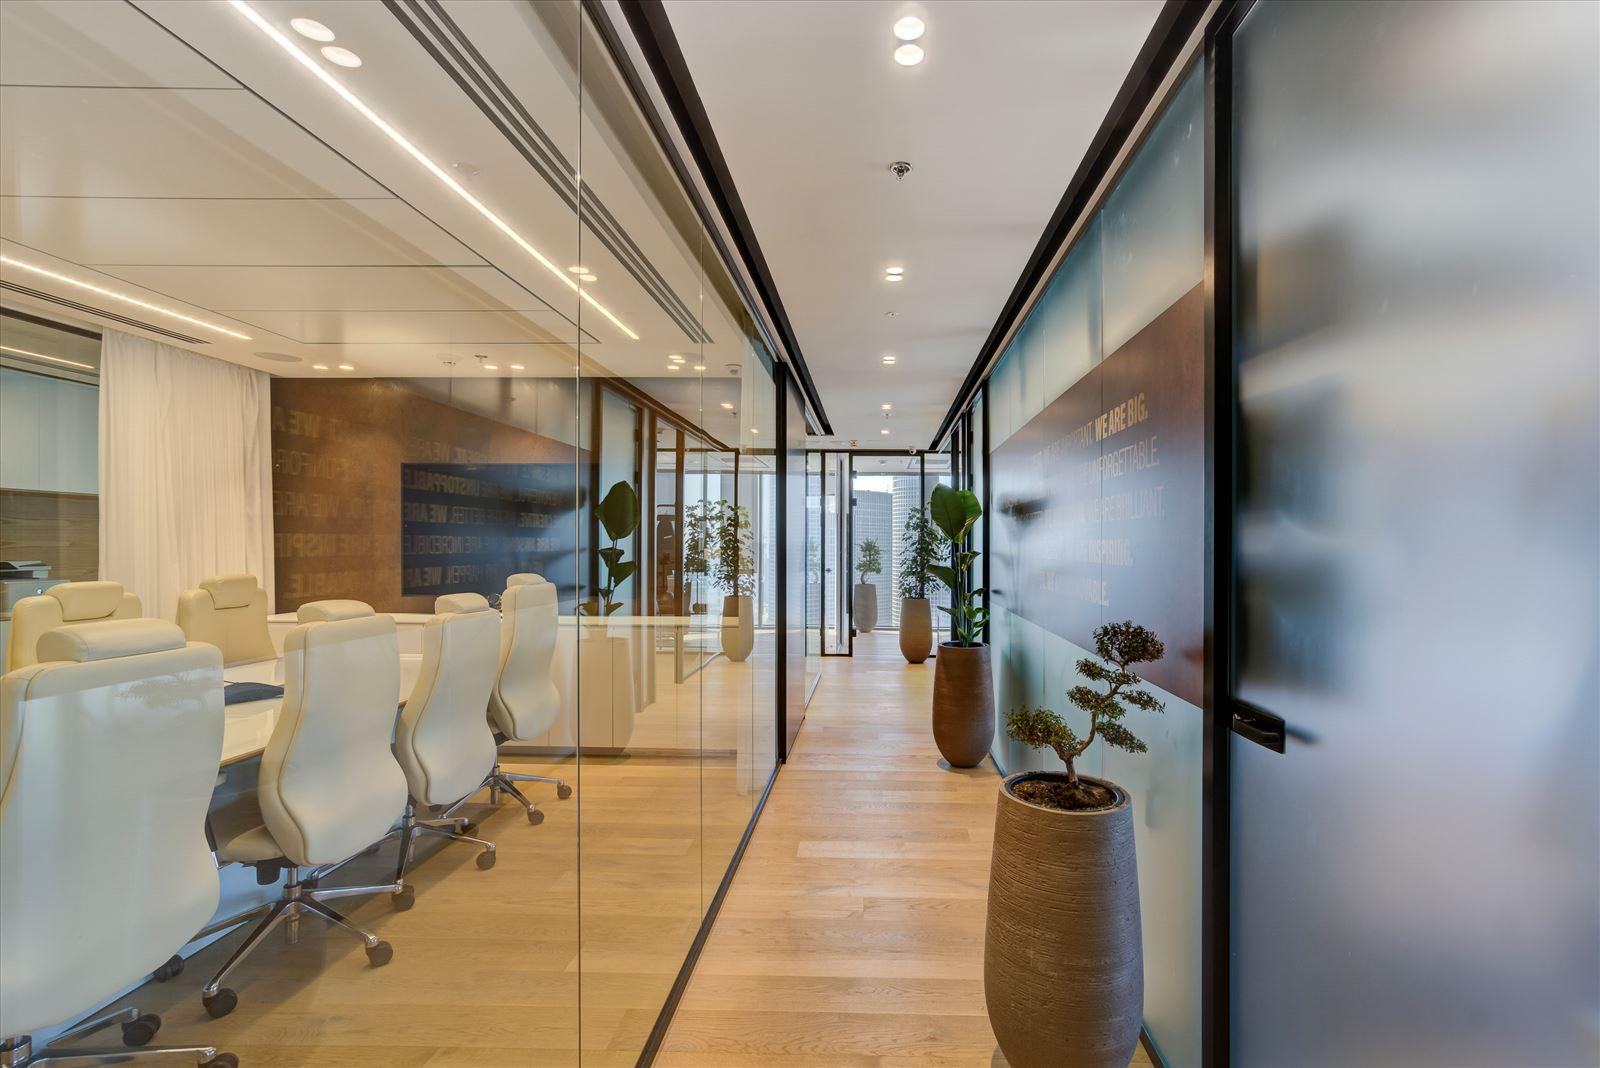 Pie Technology Office - תאורה במשרדים על ידי דורי קמחי